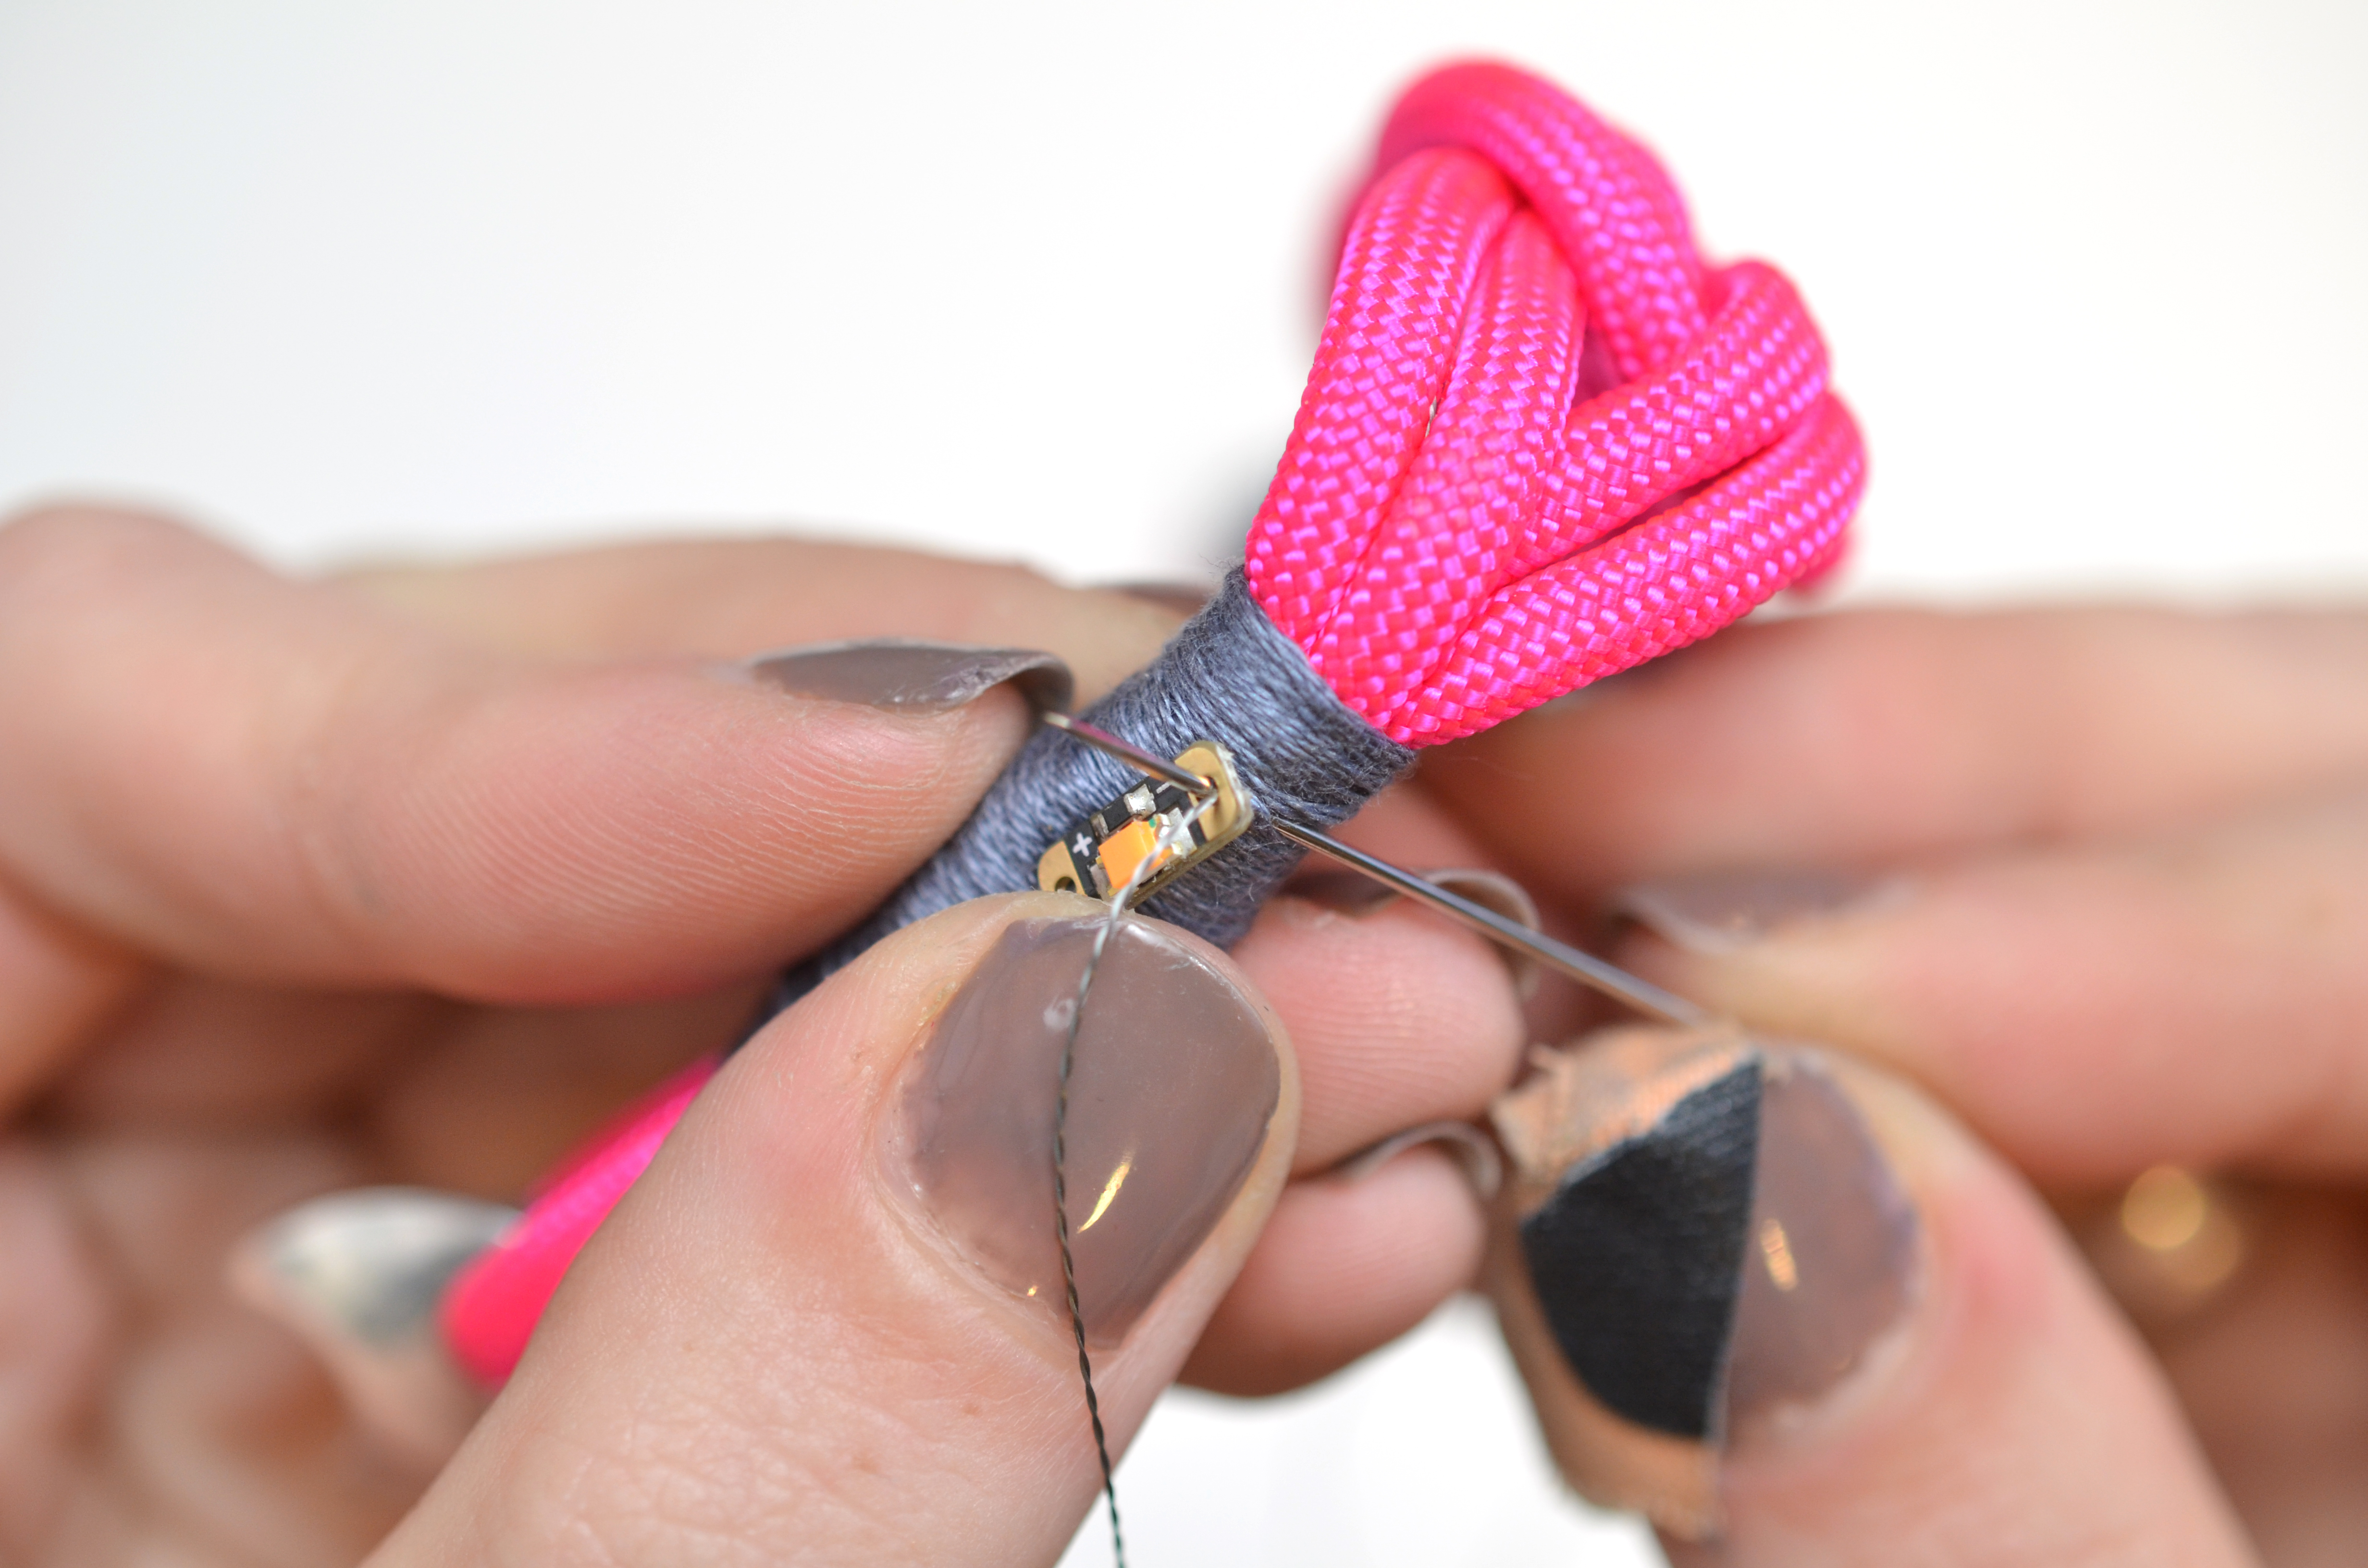 leds_nautical-paracord-led-sequin-friendship-bracelet-50.jpg